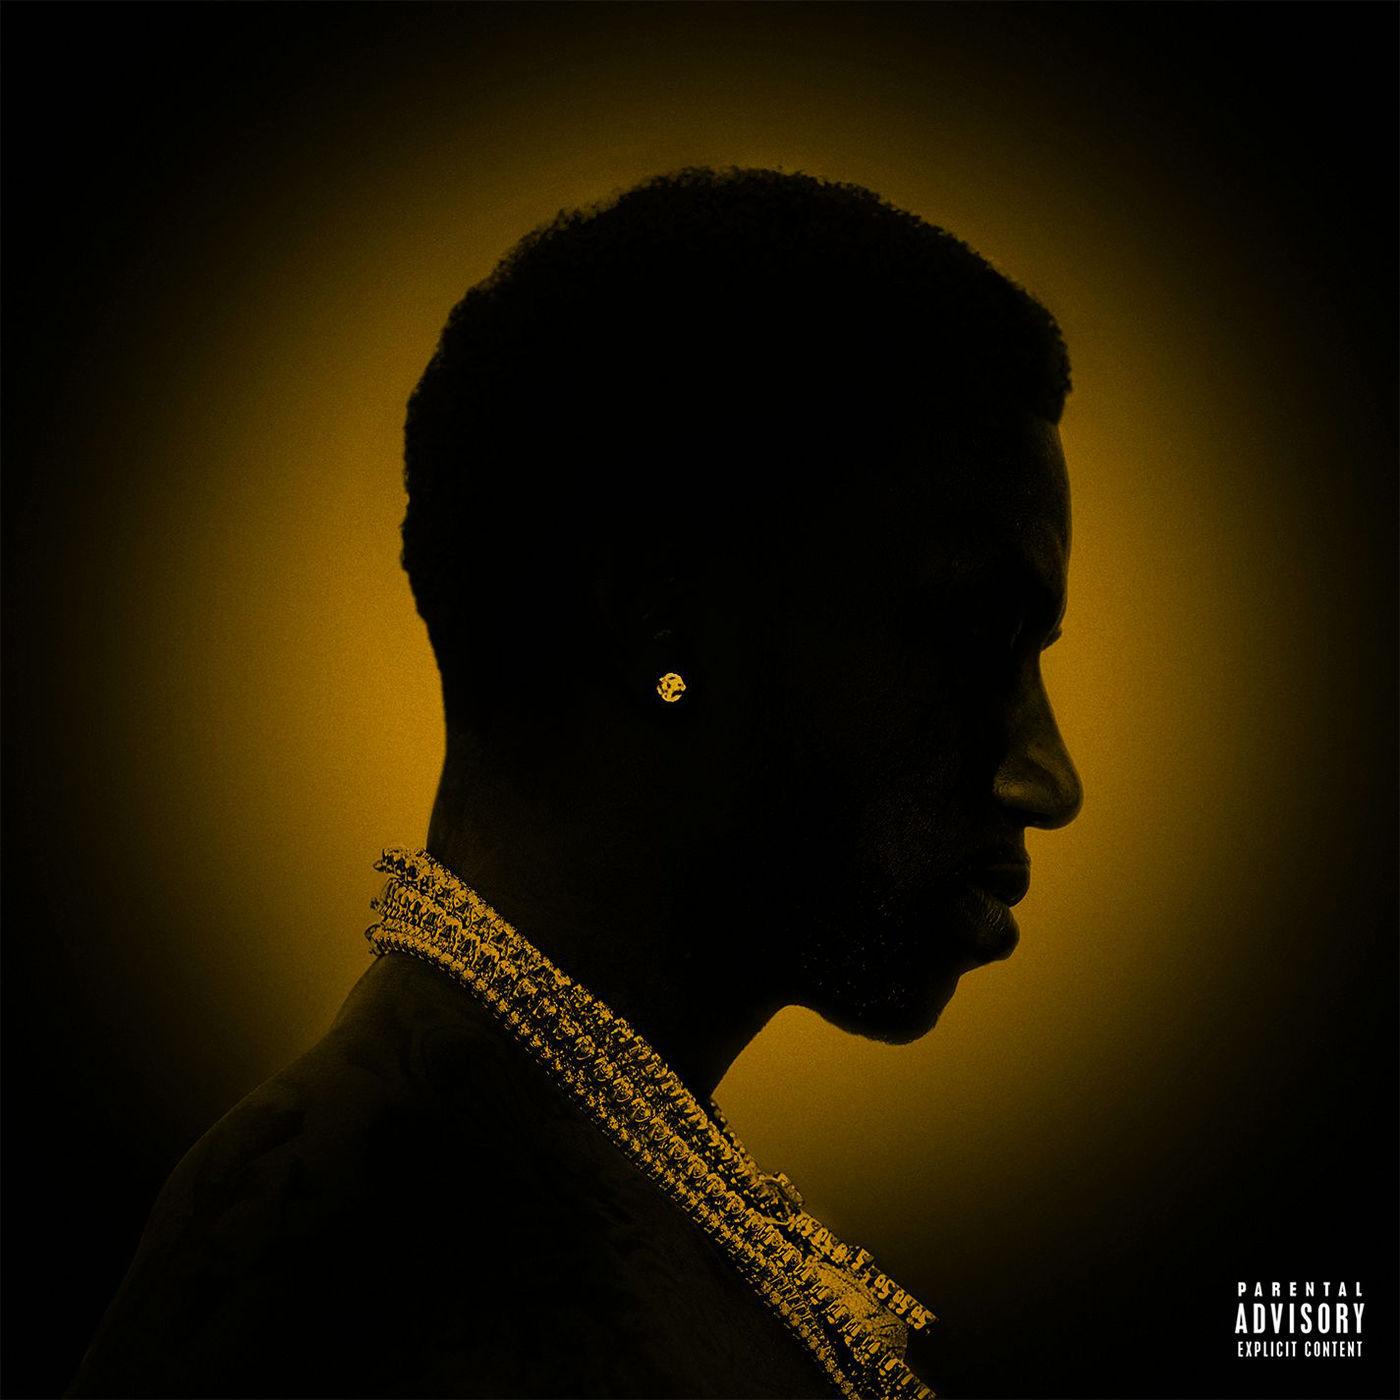 Album stream gucci mane mr davis - Gucci Mane 'Mr. Davis': Review